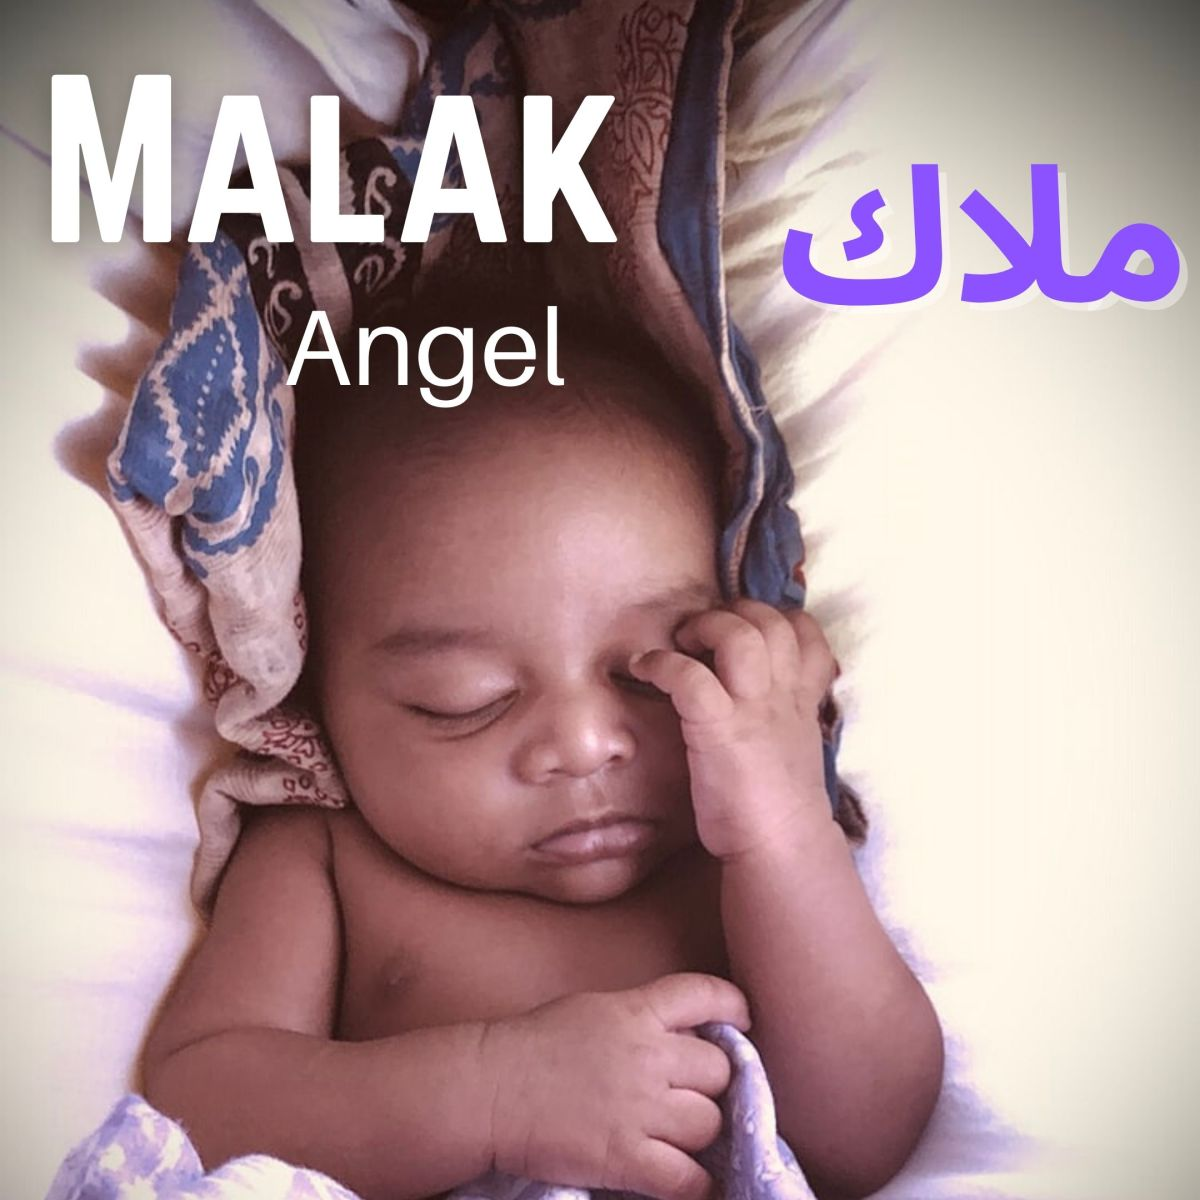 Malak is a sweet girl's name in Arabic.